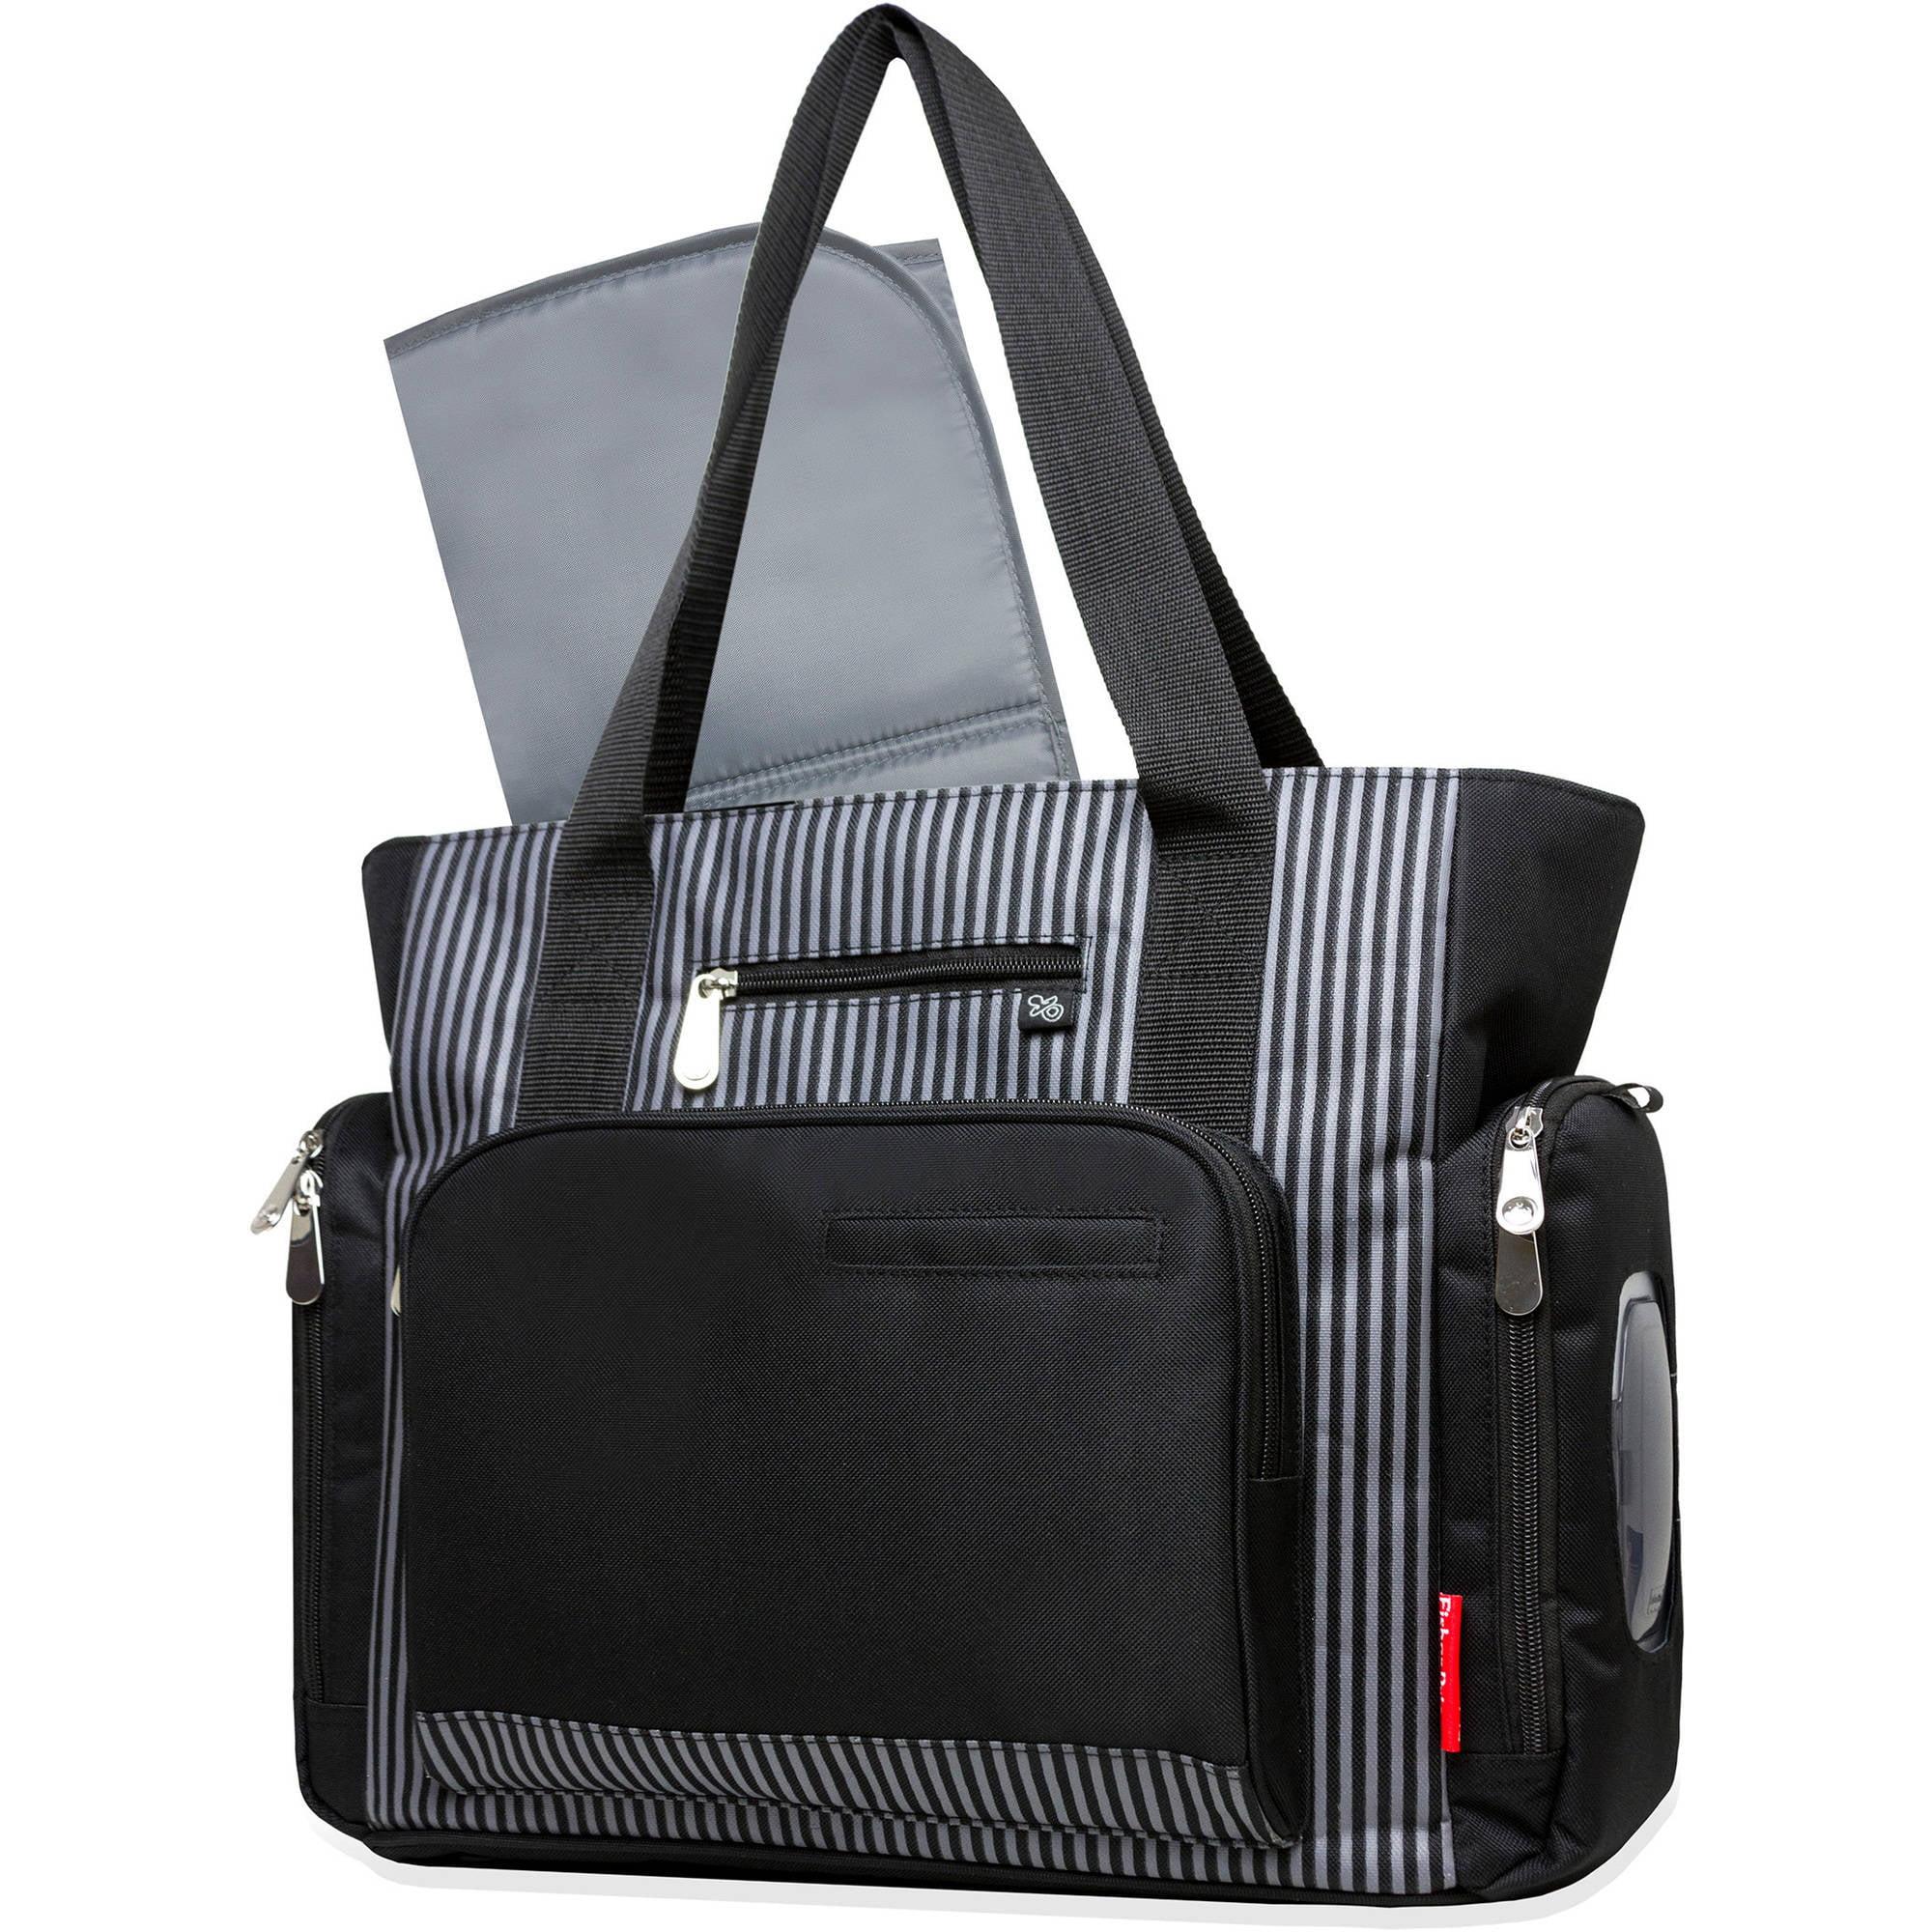 Fisher-Price Black Stripe Tote with Fastfinder Pocket System